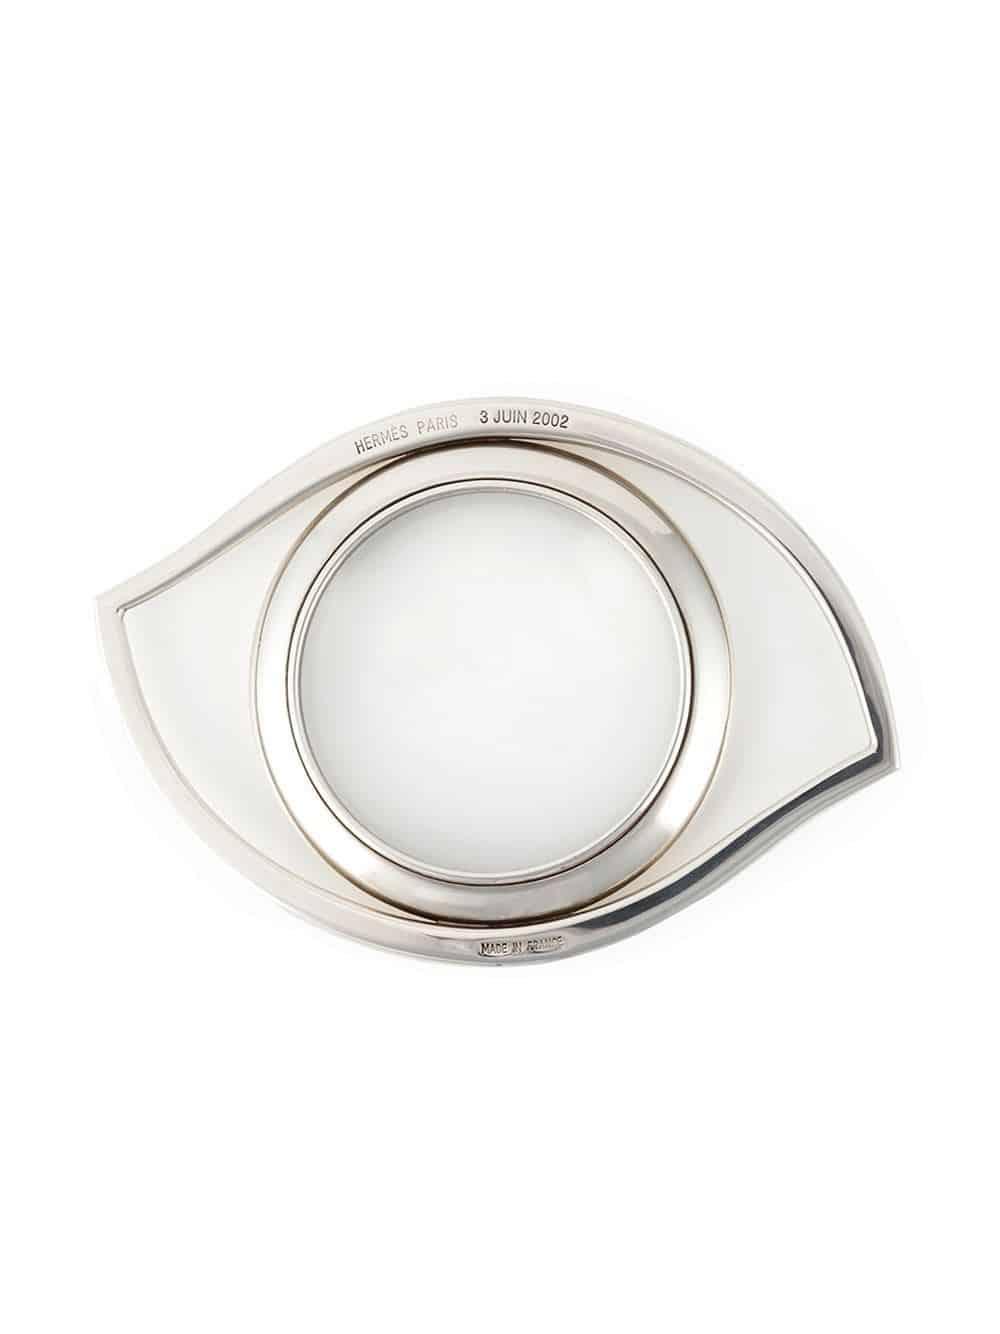 Hermès Large Eye of Cleopatra Magnifying Glass Eye 2002